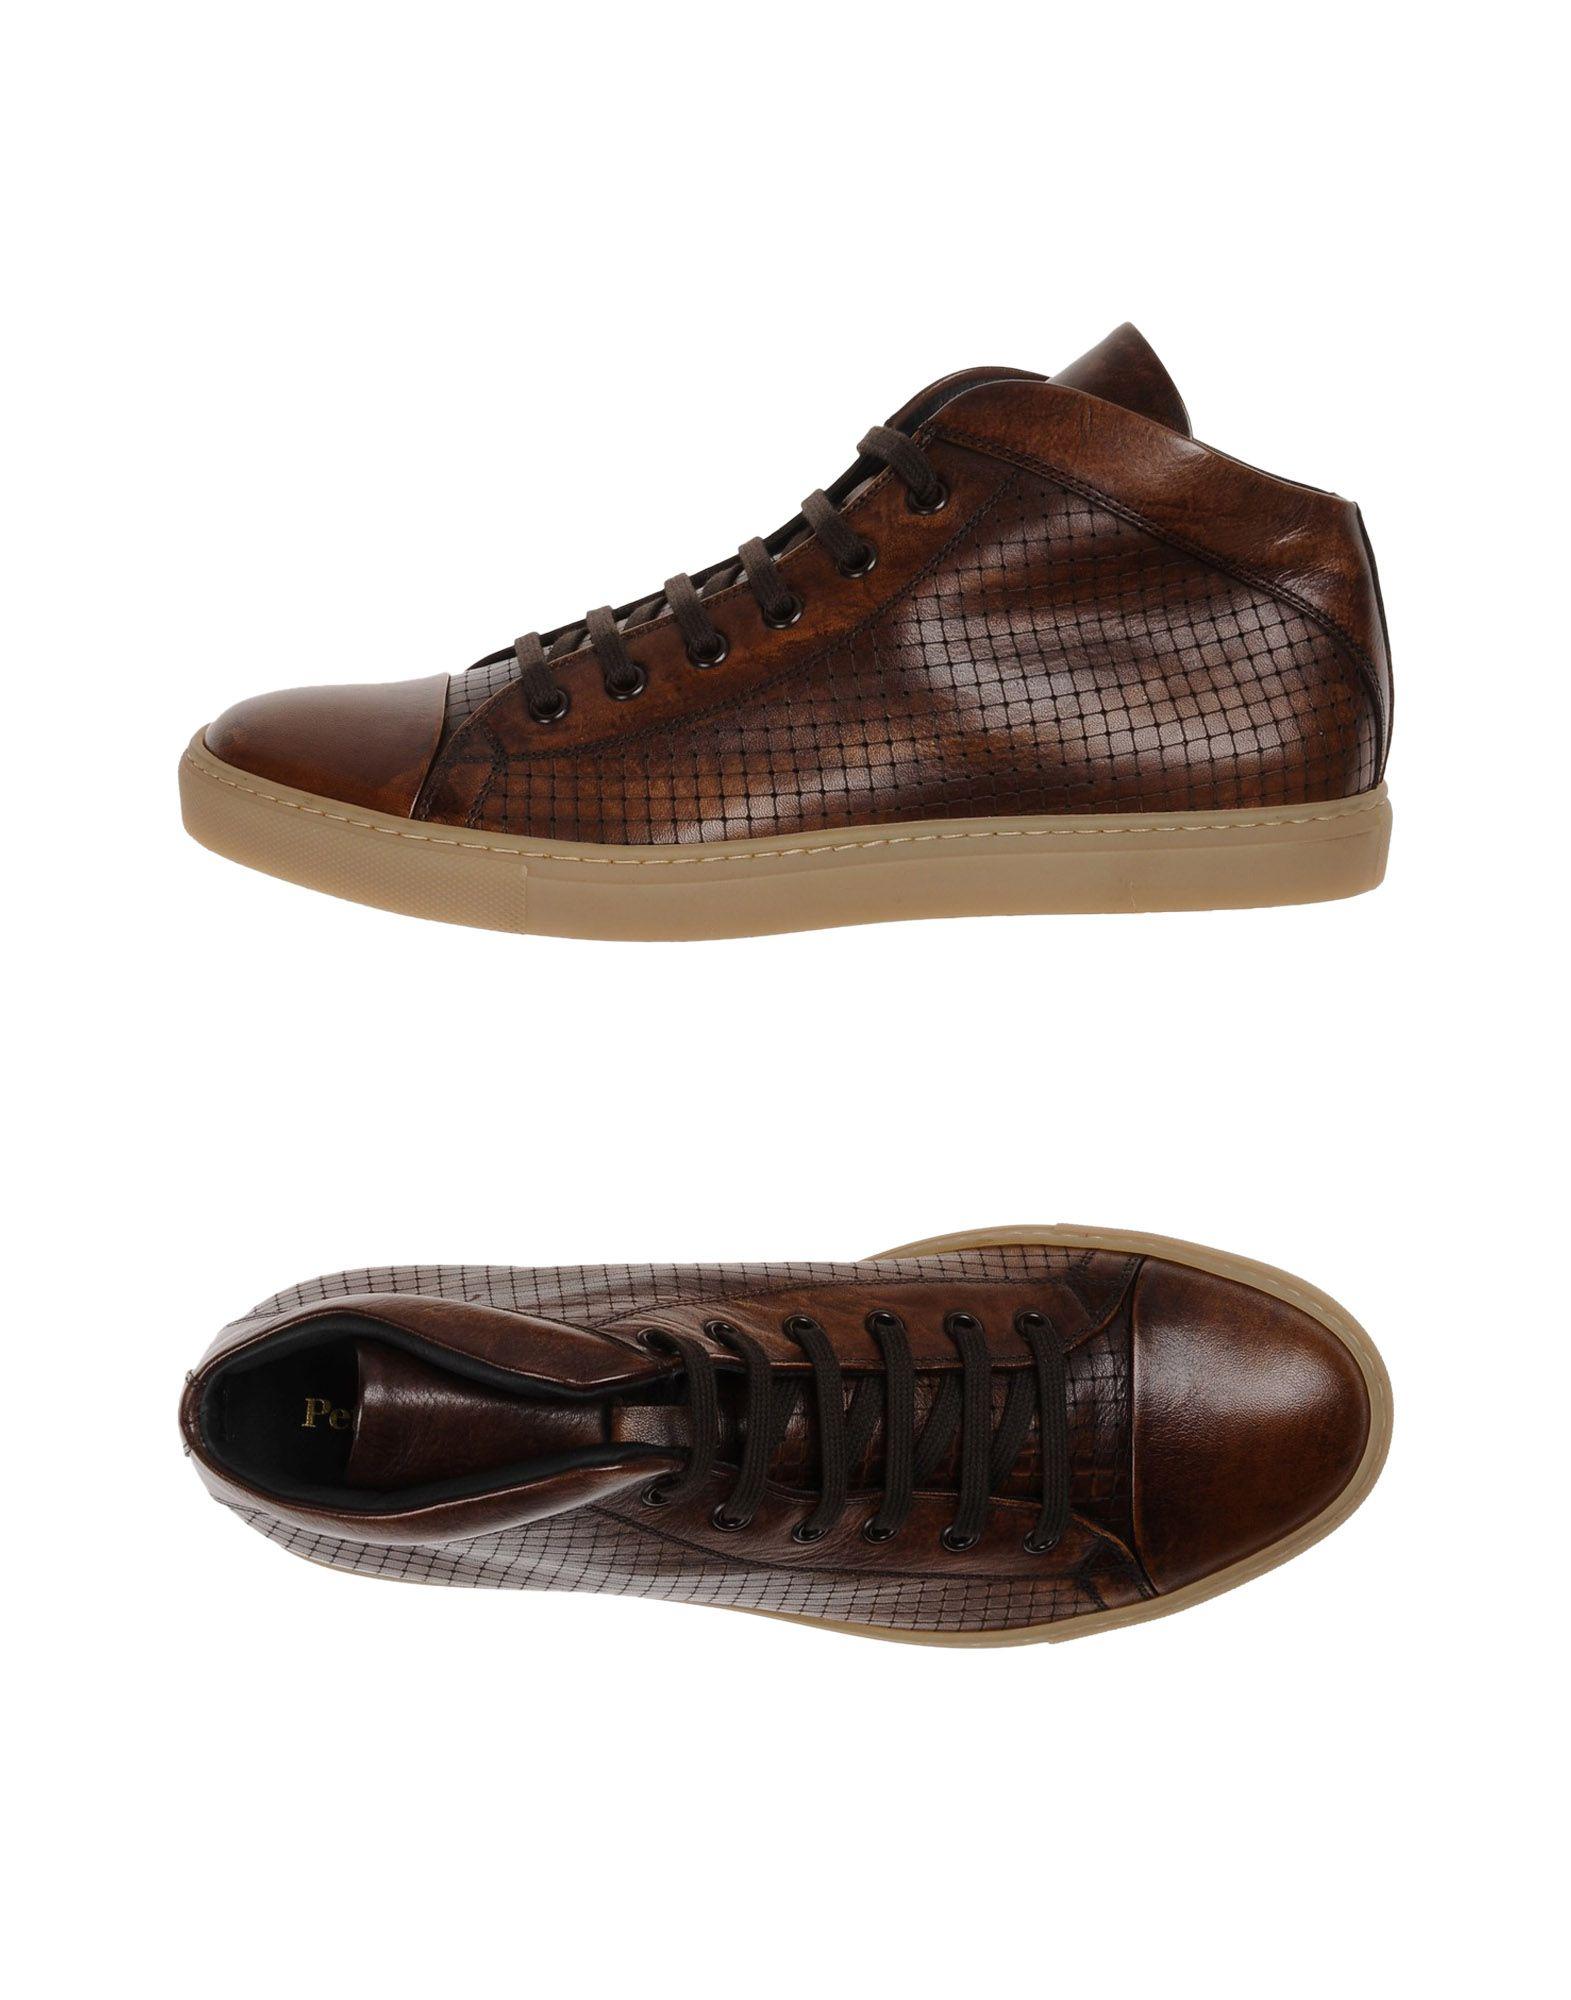 PETE SORENSEN Sneakers in Brown